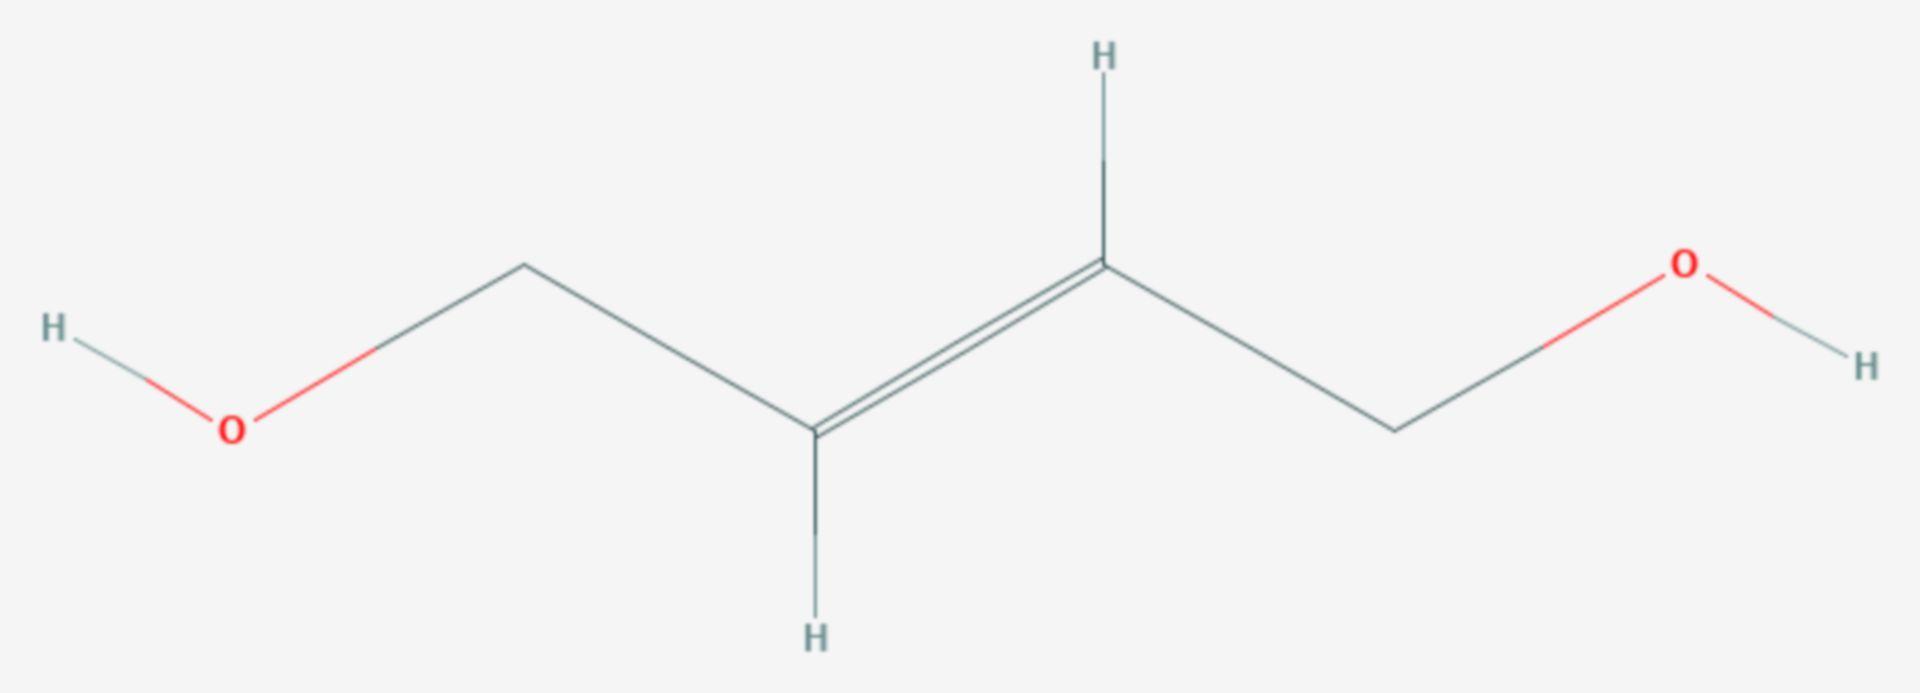 2-Buten-1,4-diol (Strukturformel)